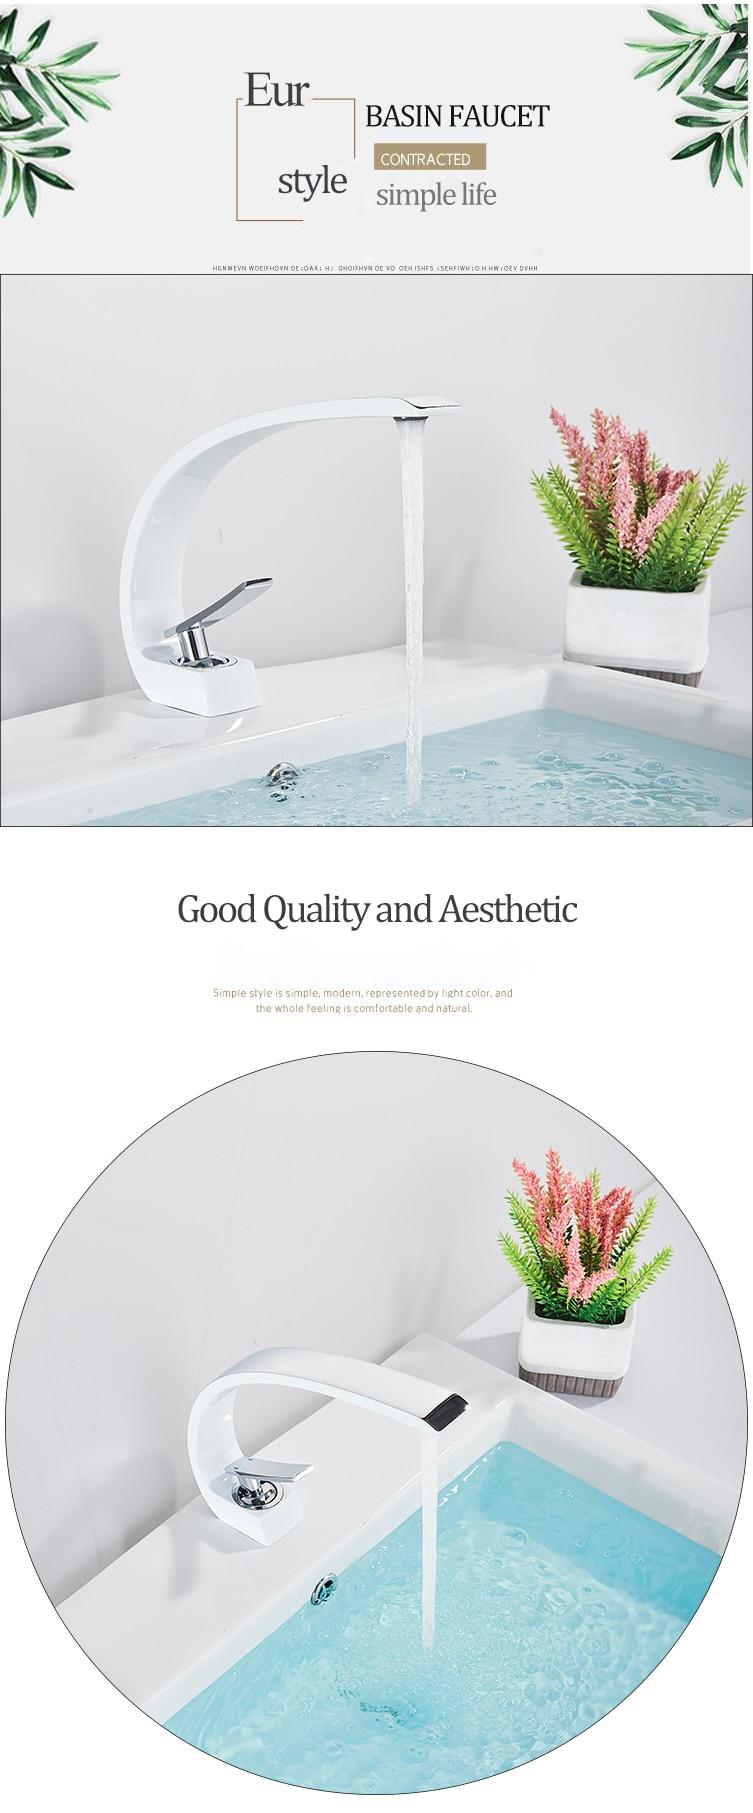 Hca1ba2479e4243d68bde3fe7c83cc3a2u Senlesen Bathroom Faucet Ceramic Valve Cold and Hot Water Mixer Tap Single Handle Vanity Sink Basin Faucets